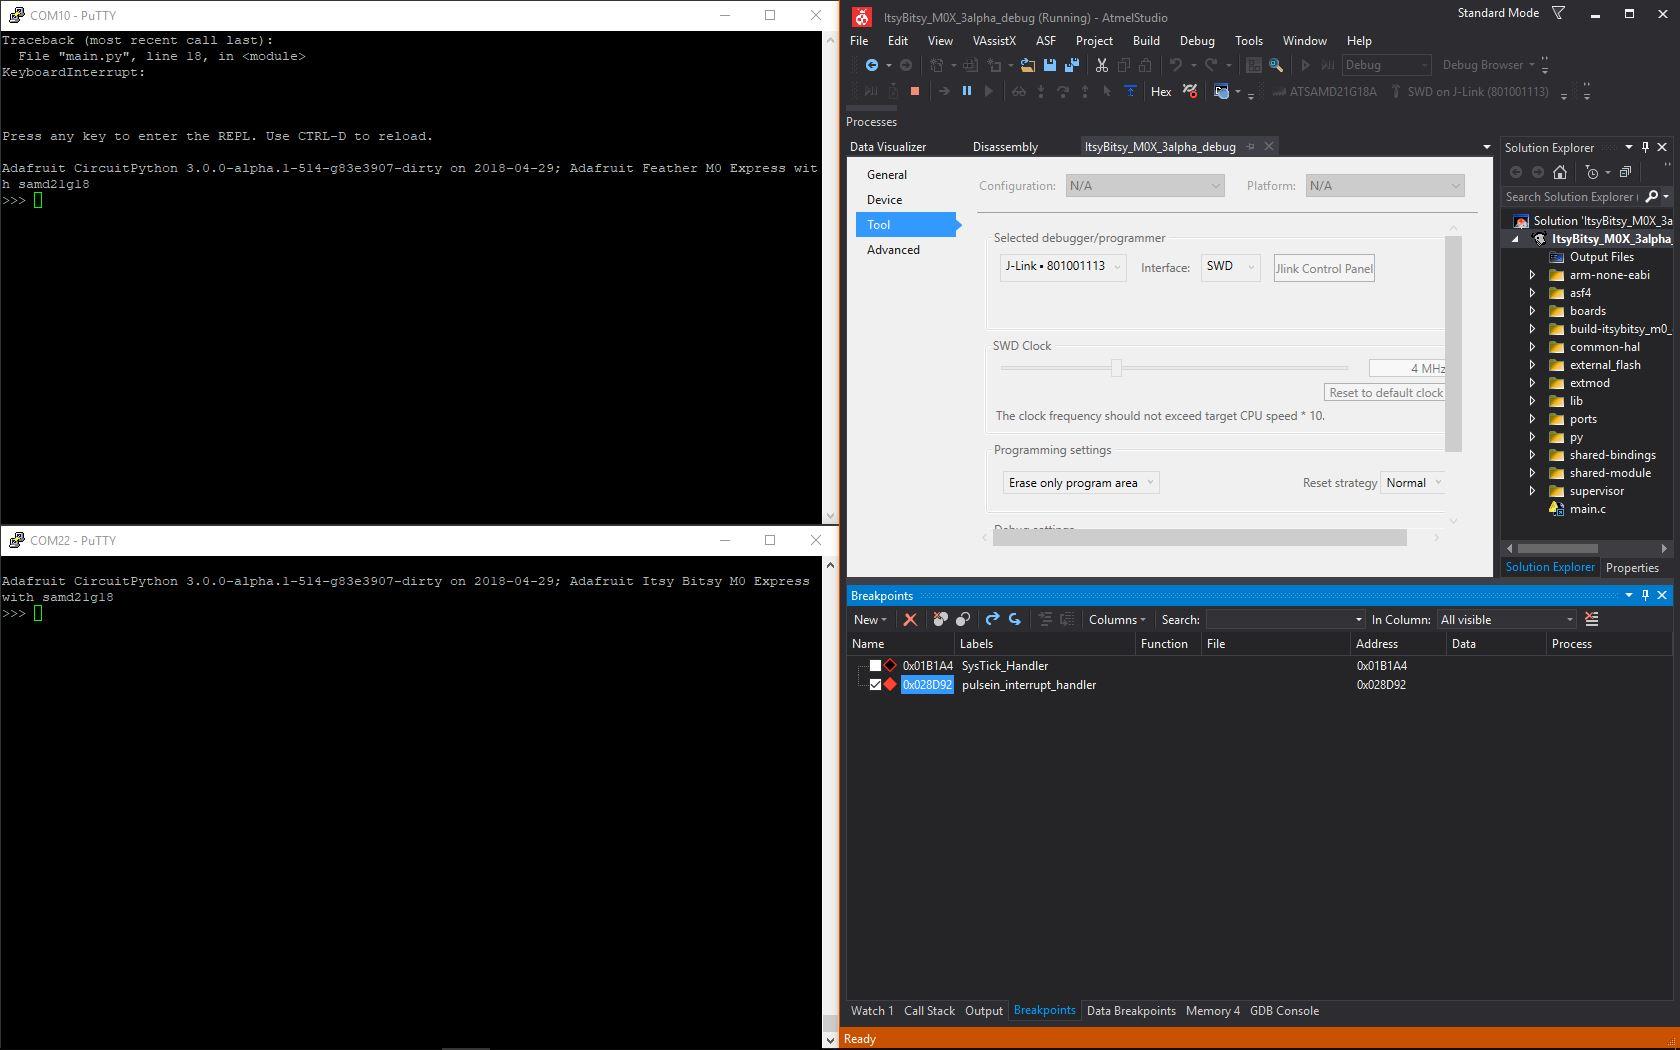 microcontrollers_PulseIn_Debug_Full_Screen_Device_Running.jpg